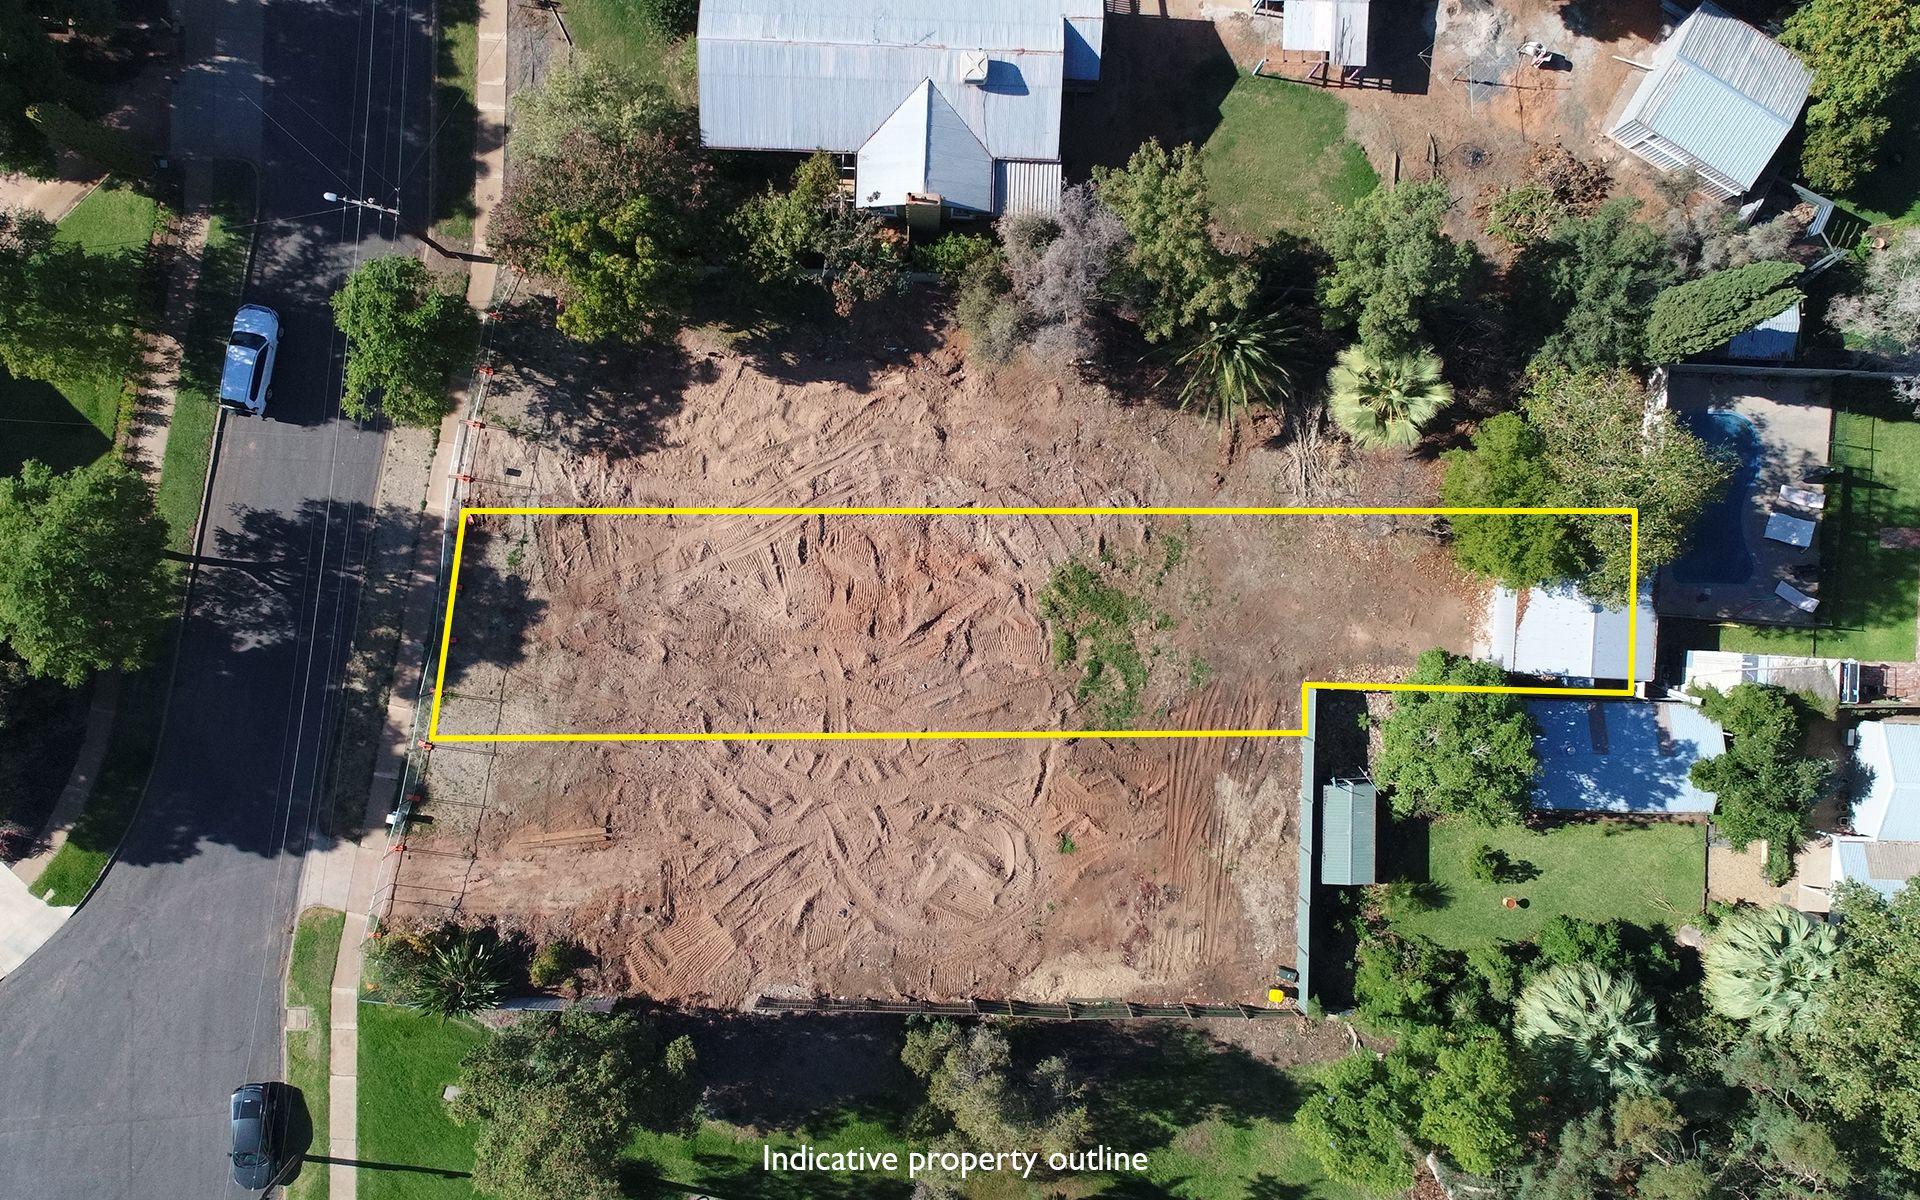 Lot 1/5 Willow Grove - Stage 2, Mildura, VIC 3500